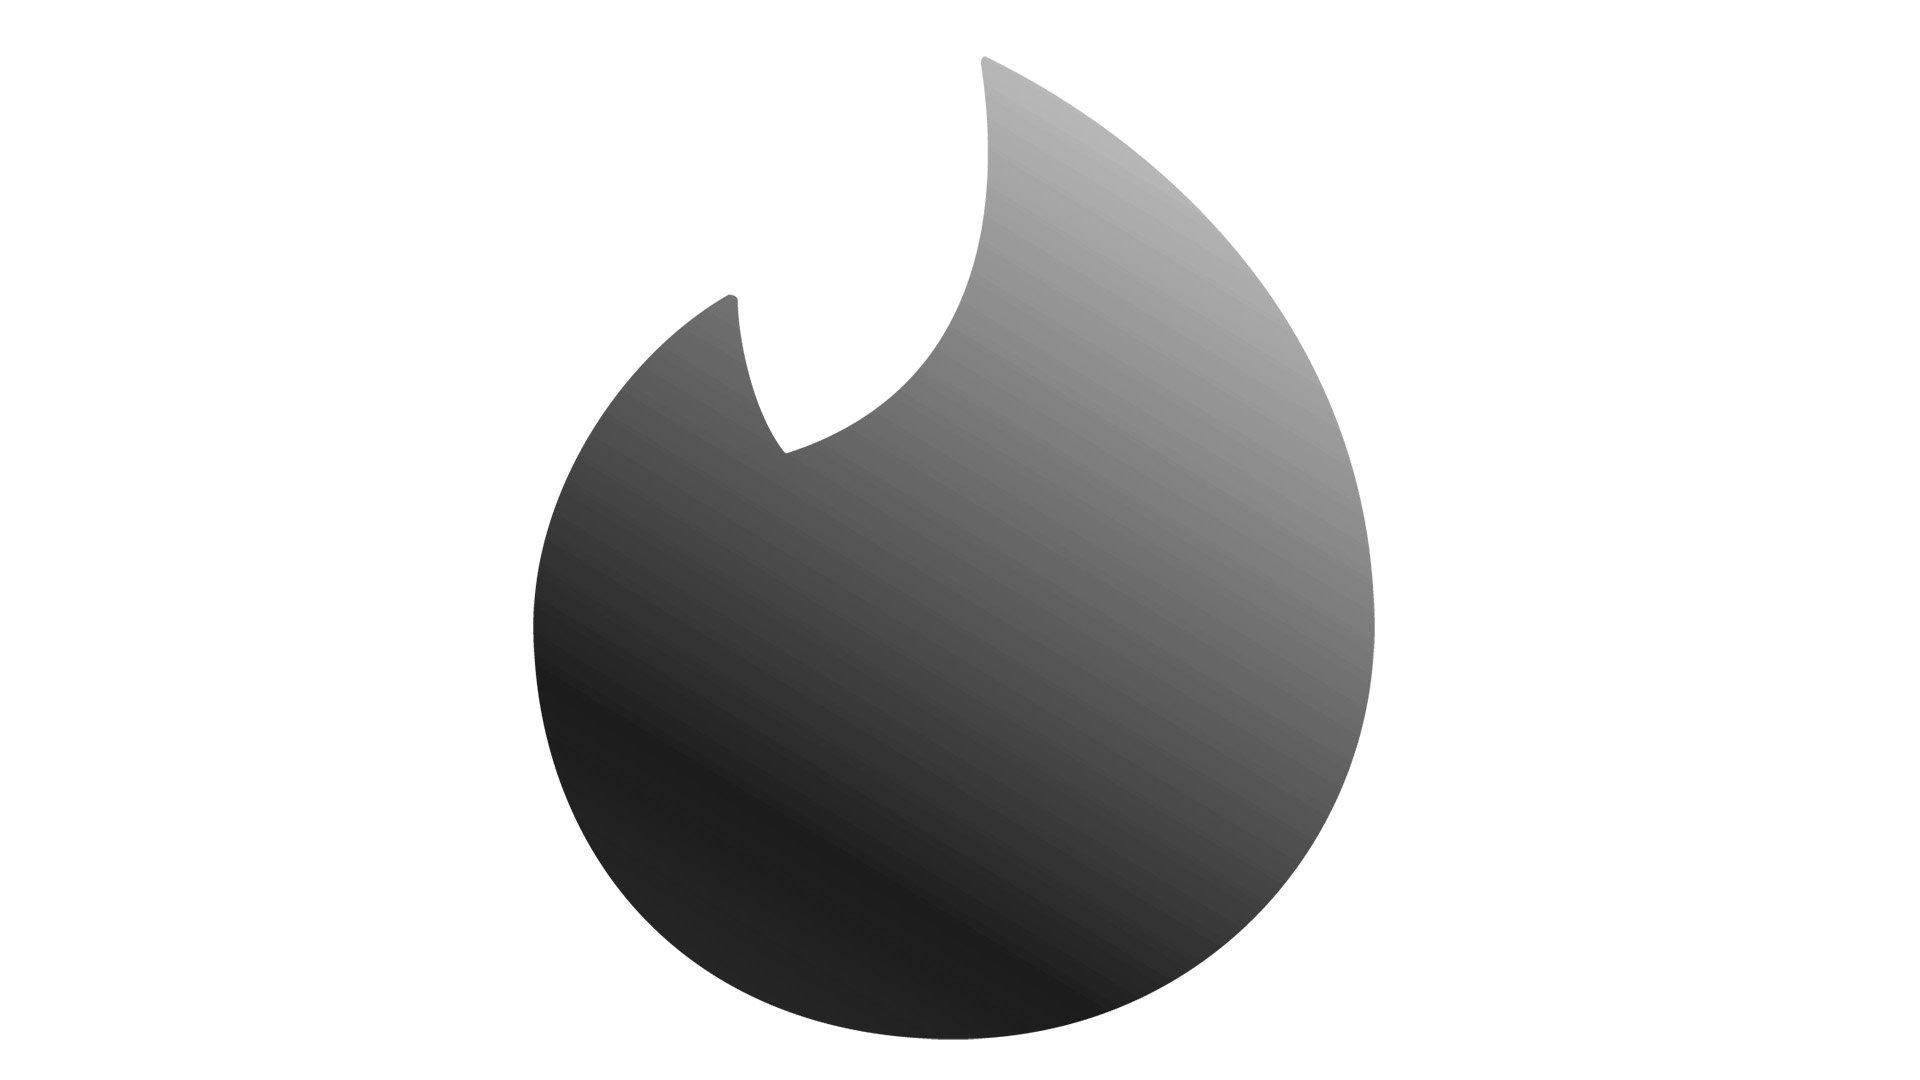 Logo tinder blinking app The Tinder